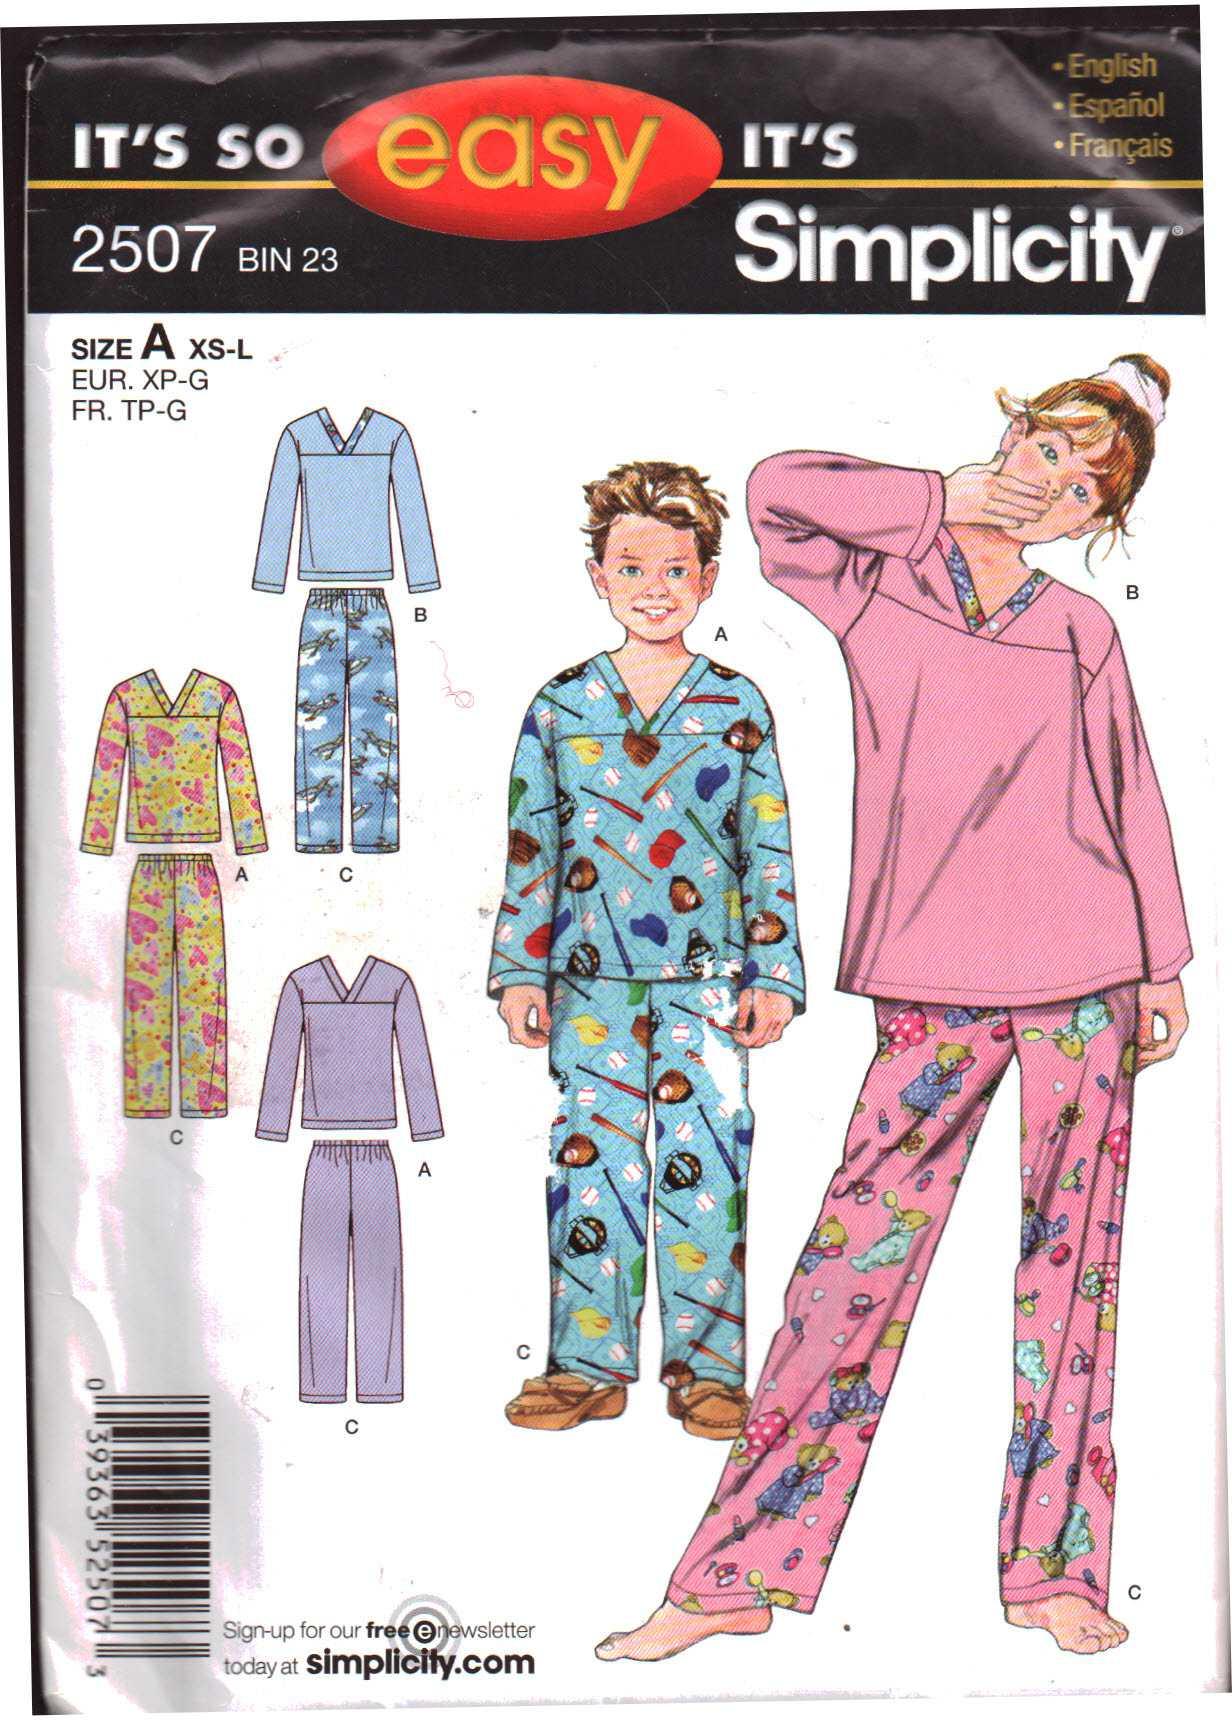 Simplicity 2507 Girl's, Boy's Pajamas Pants, Tops Size: A XS-L Uncut Sewing  Pattern